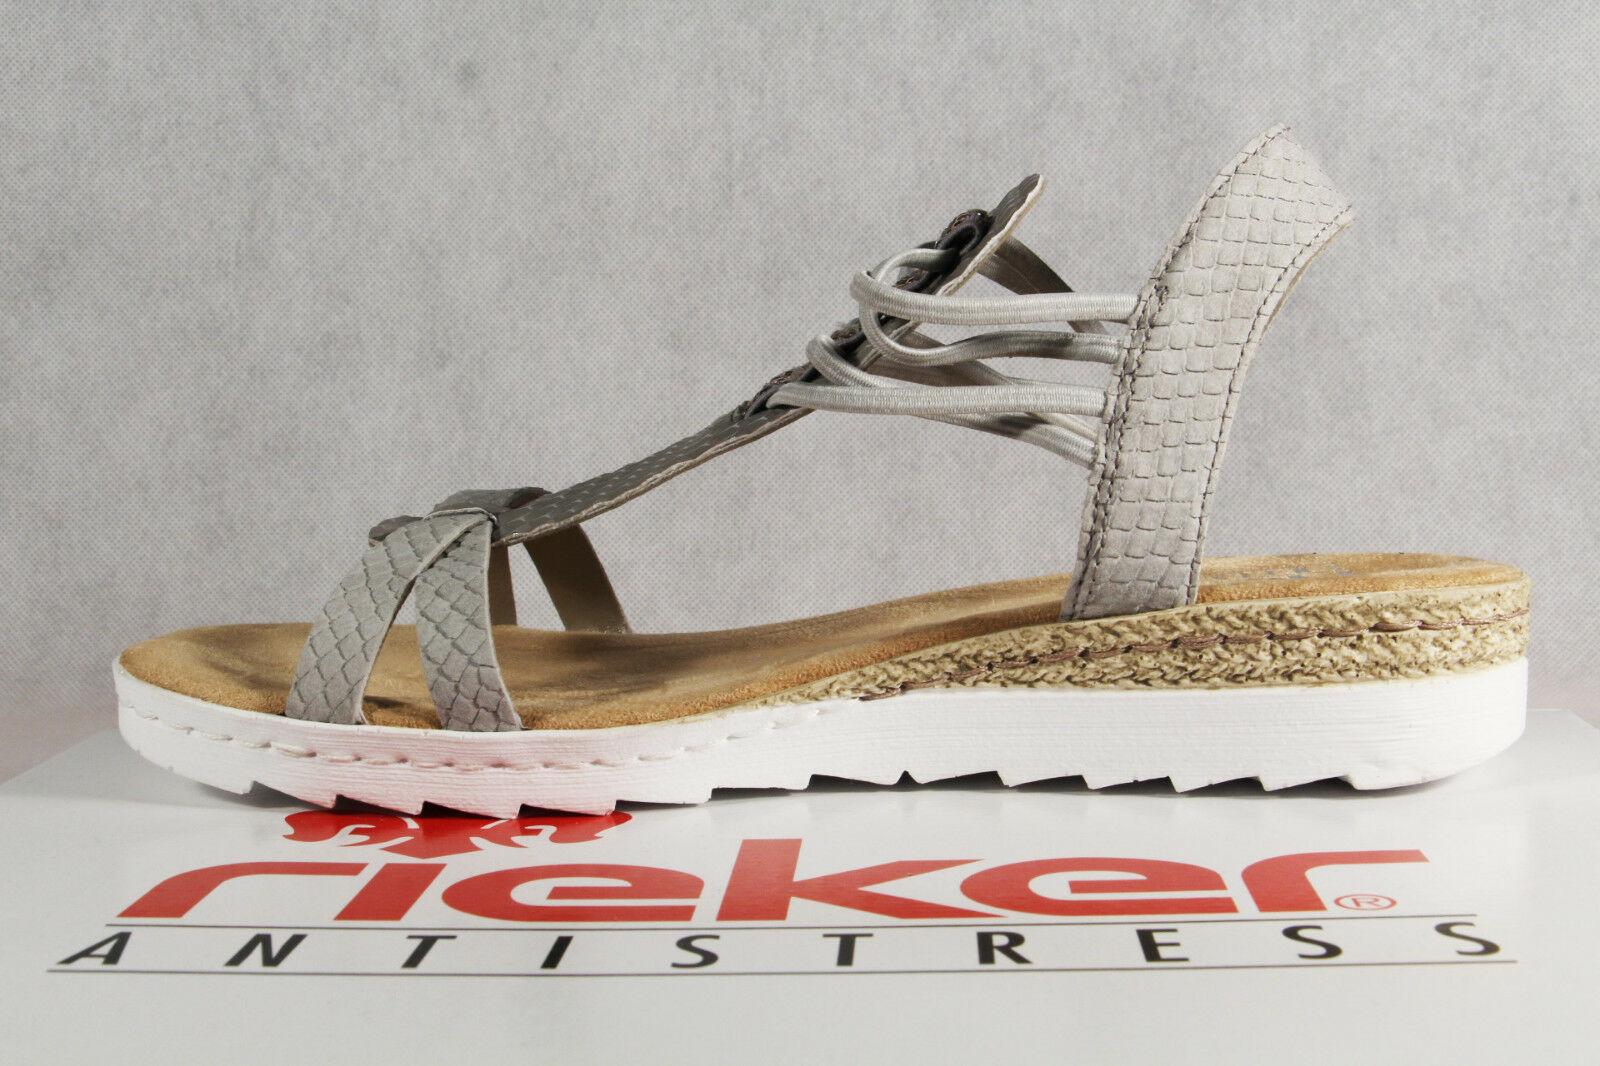 Rieker Damen Sandalen Sandale Sandalette grau 66506 NEU!!